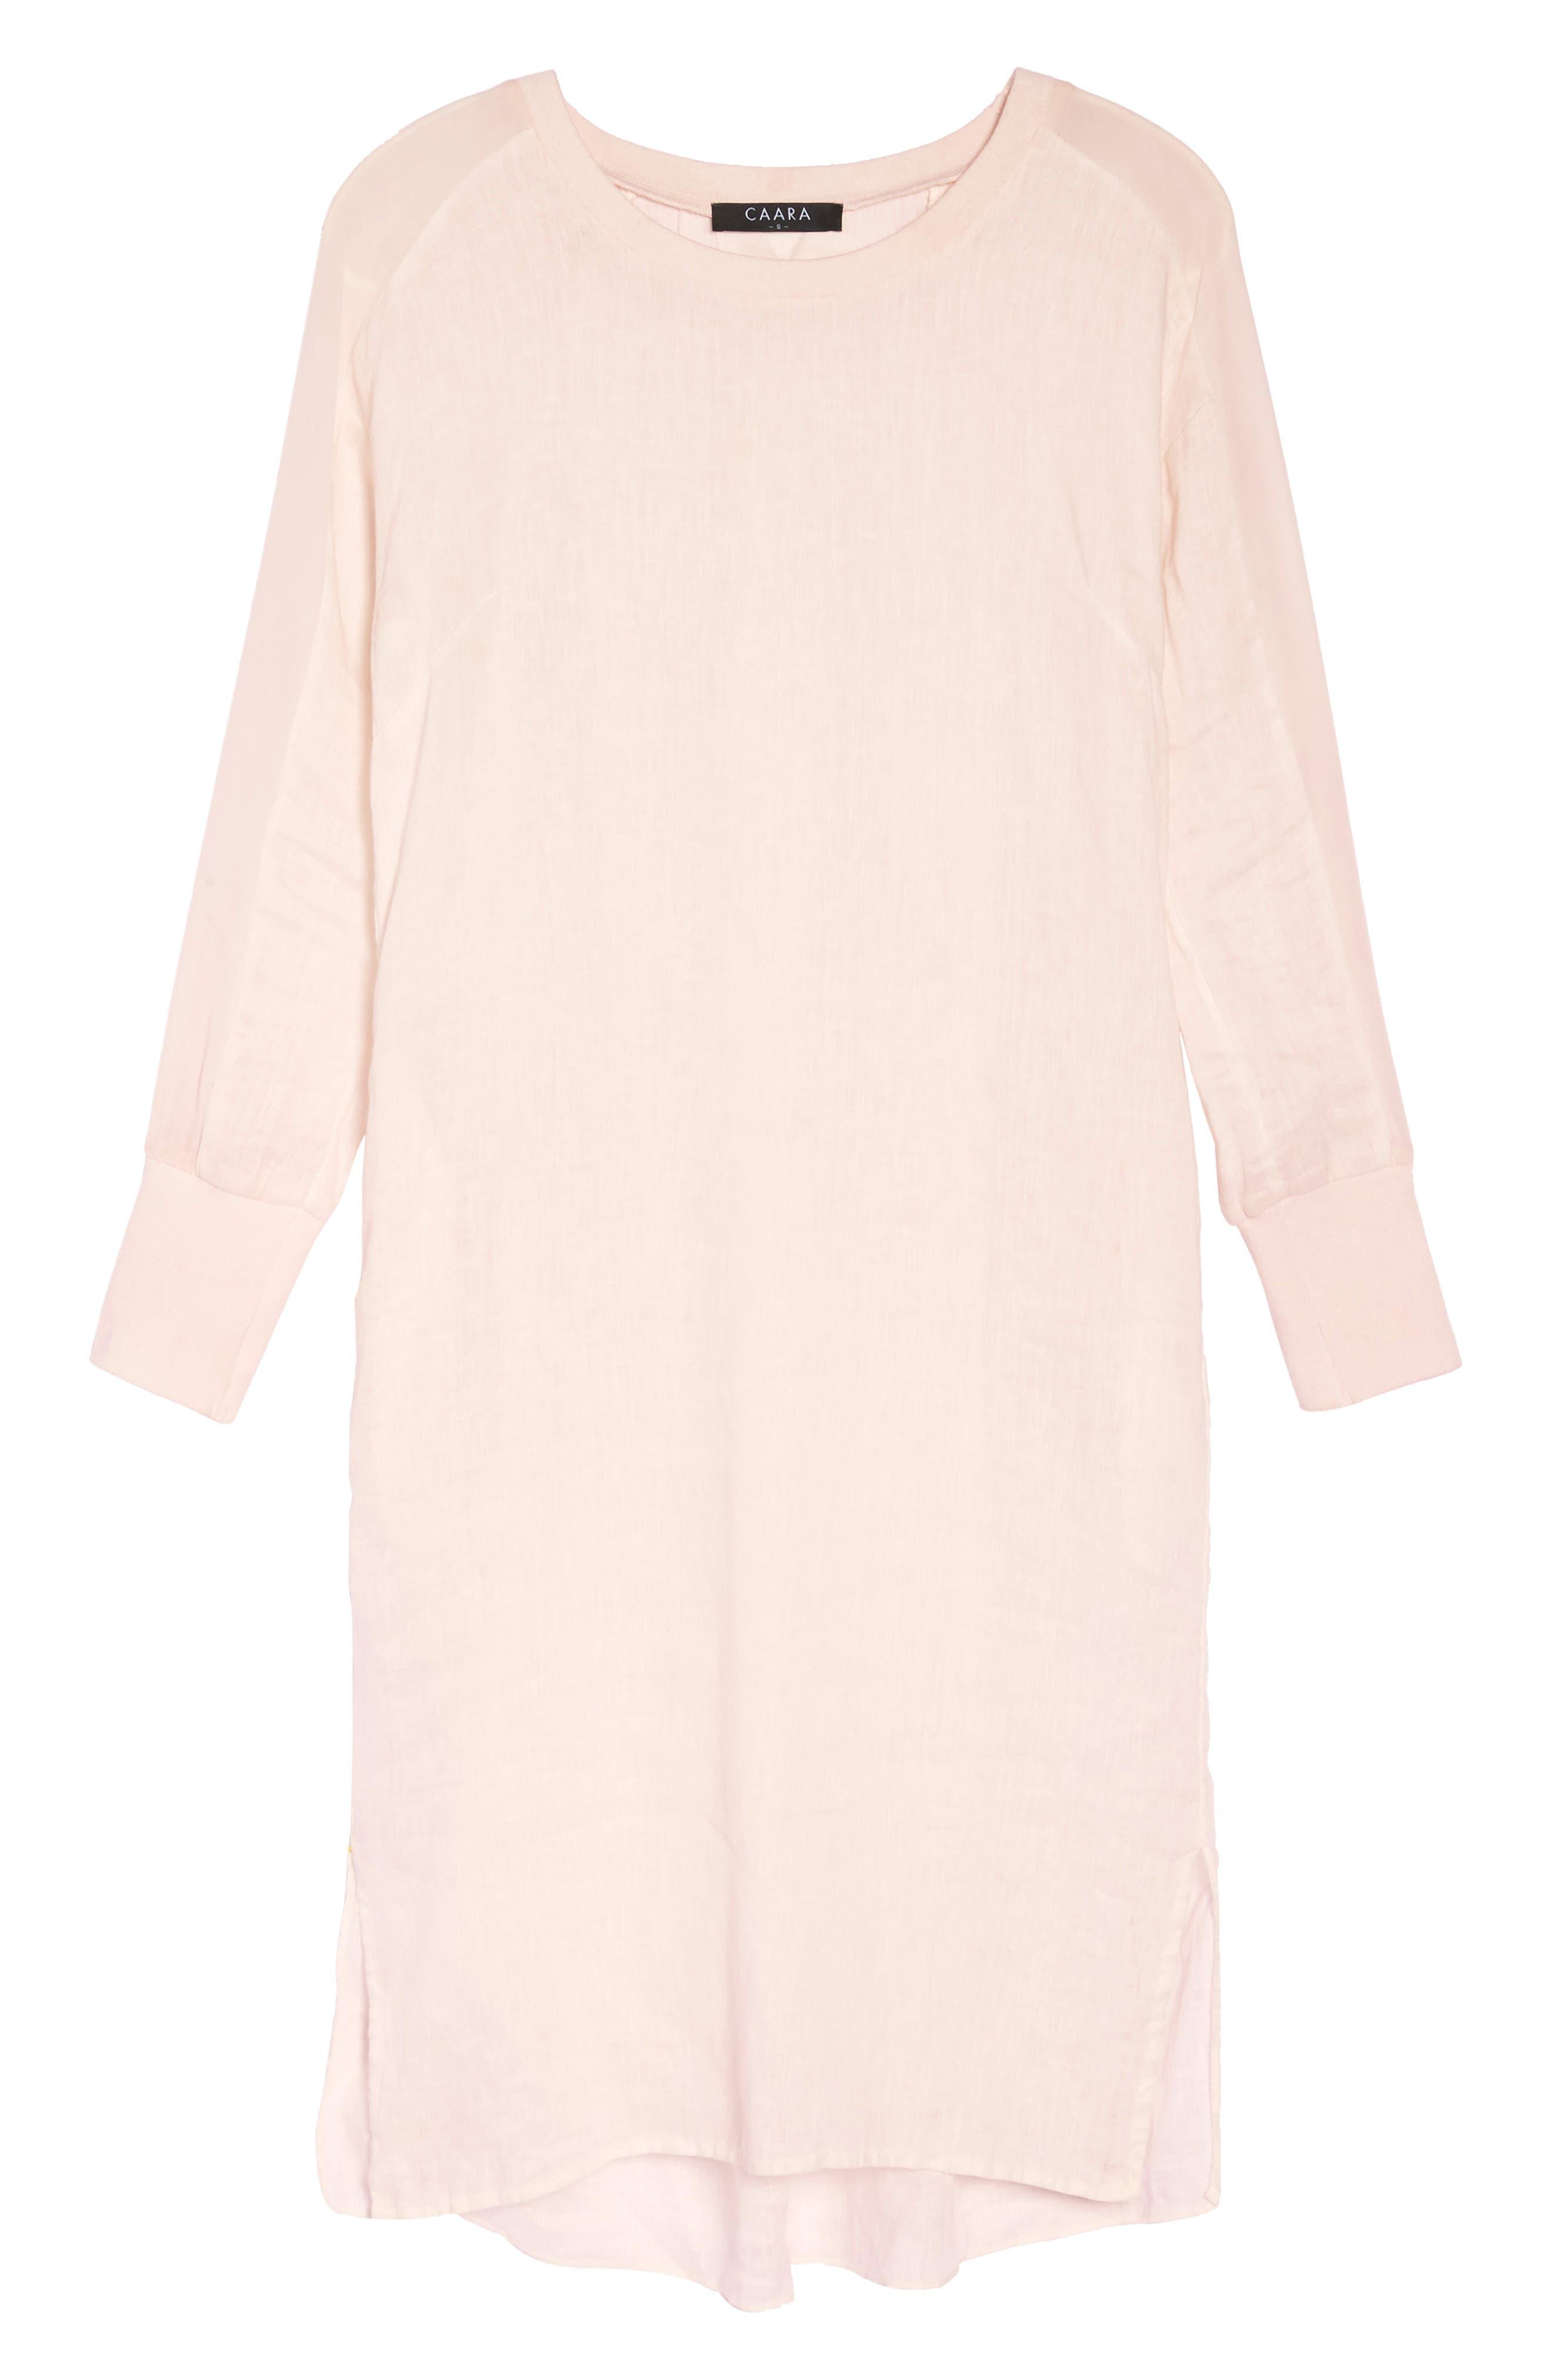 Rata Linen Shift Dress,                             Alternate thumbnail 8, color,                             680